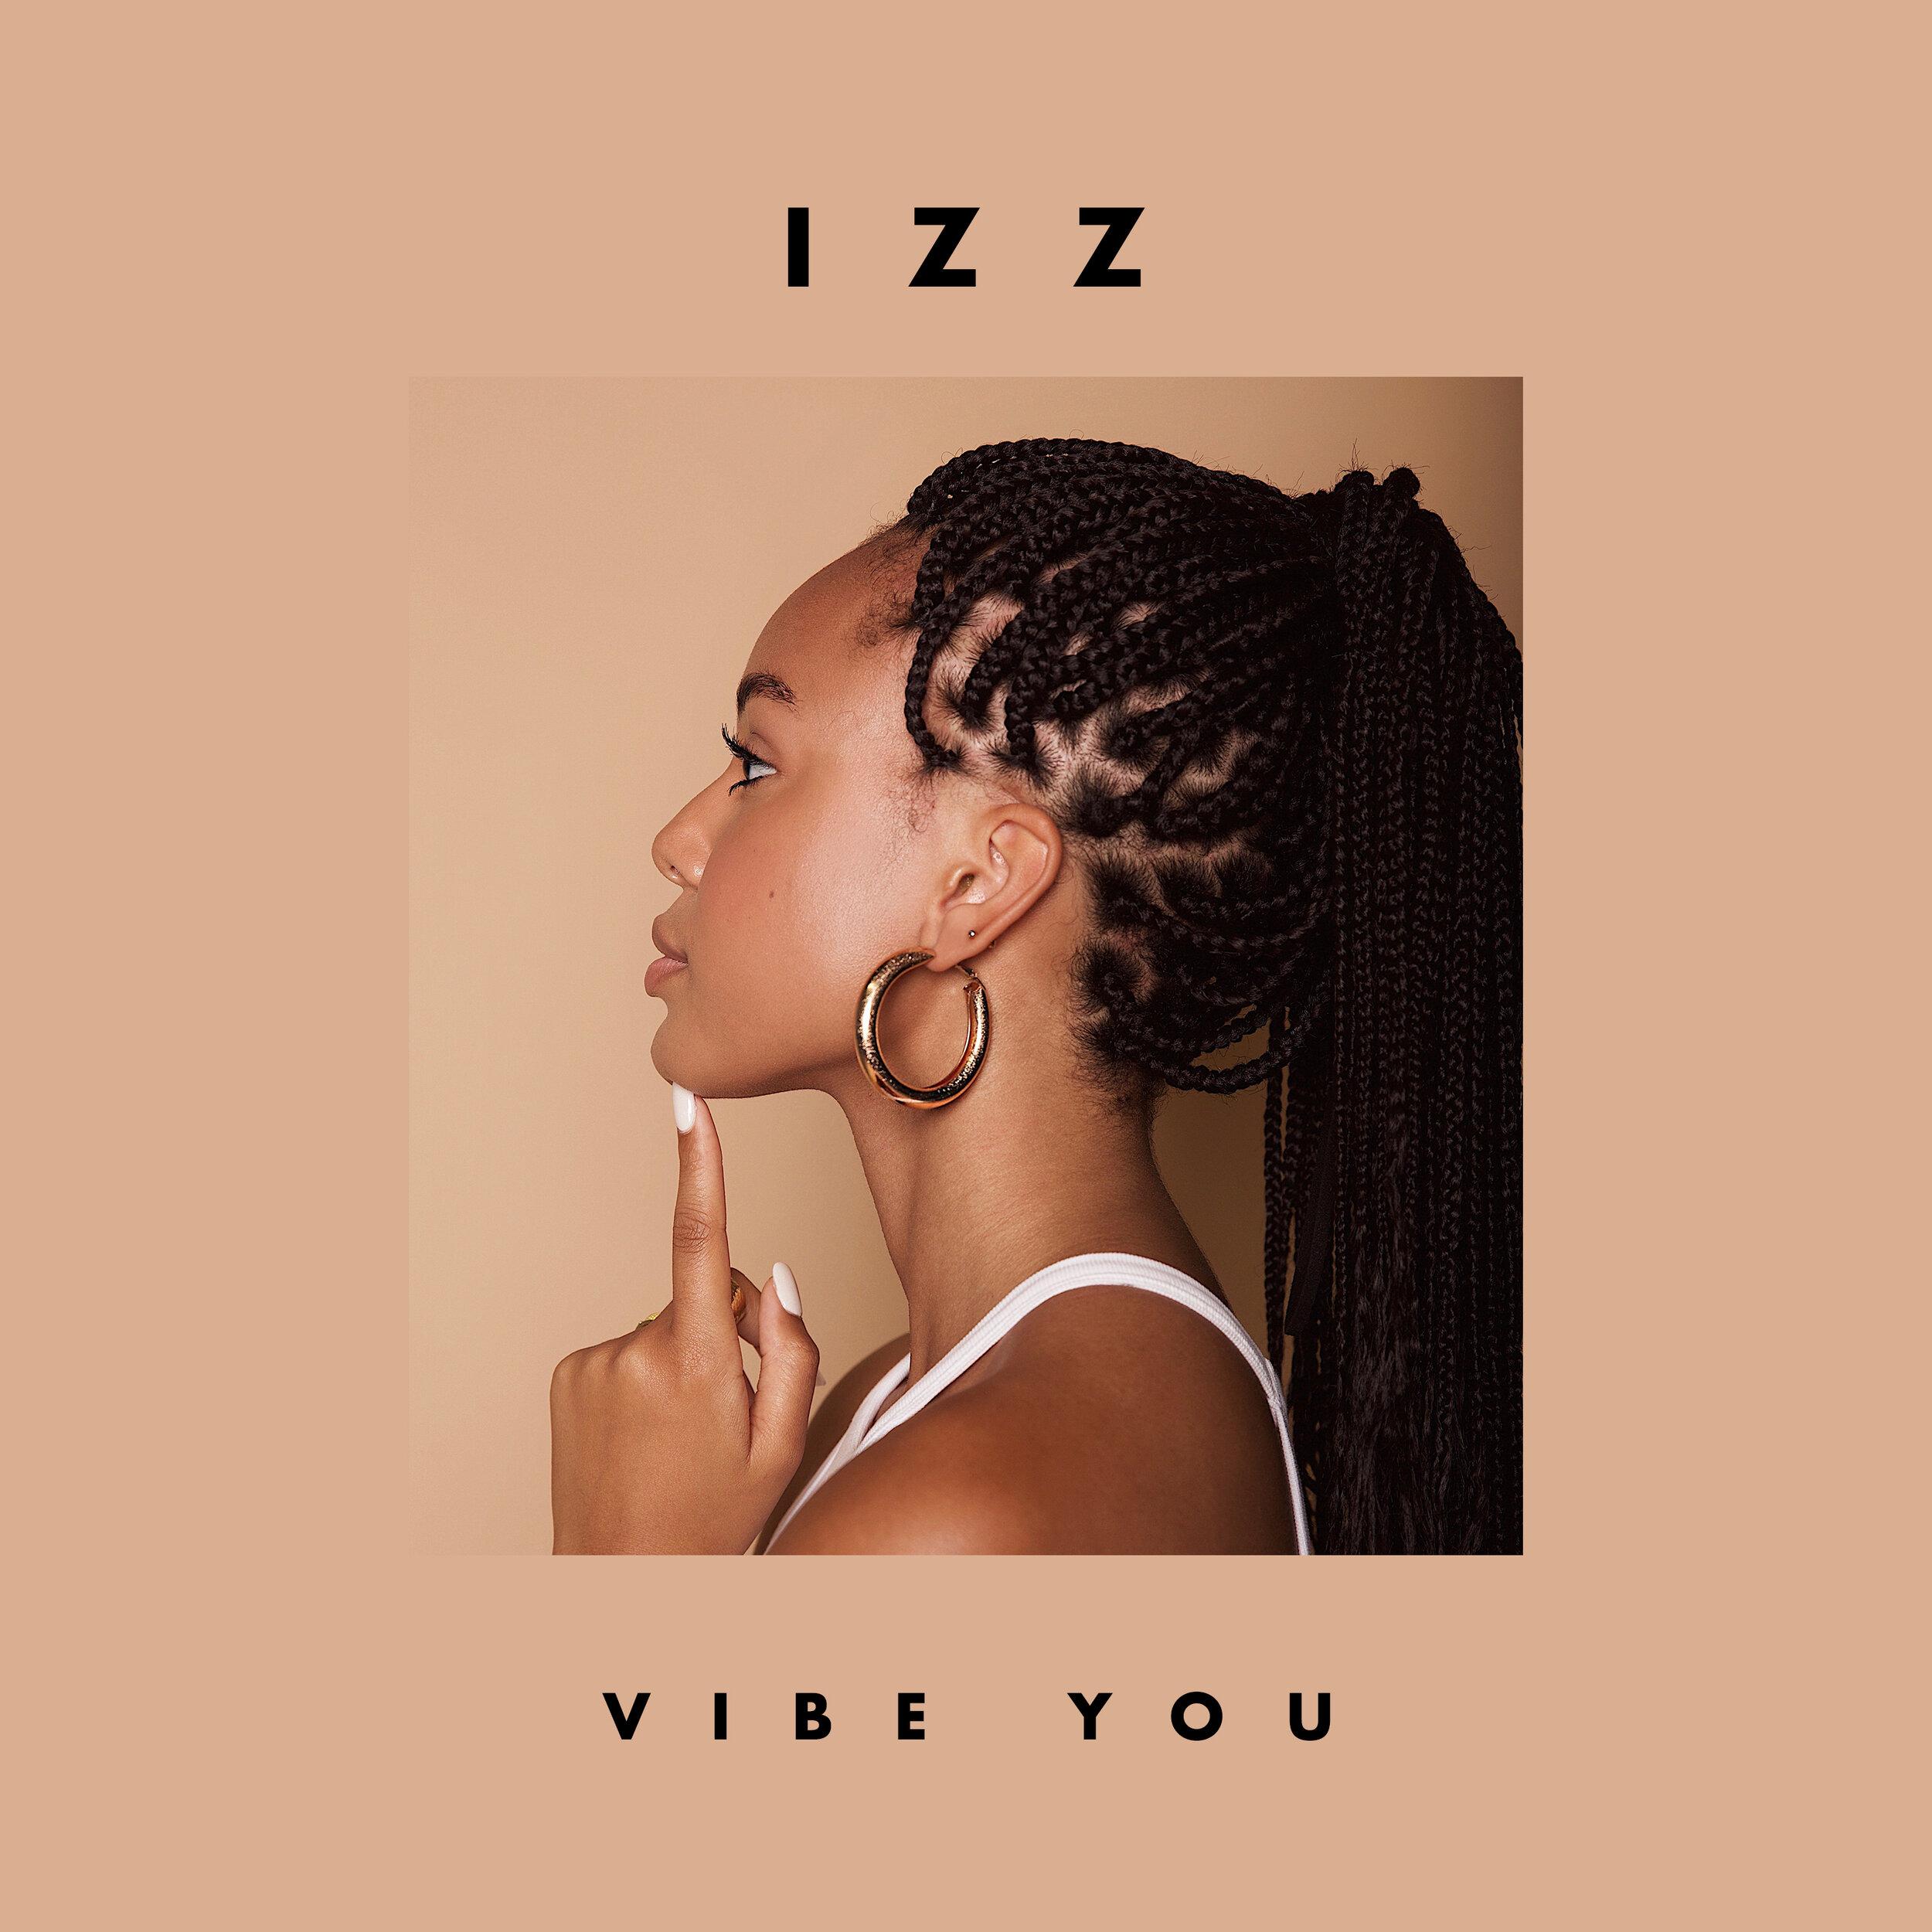 VIBE YOU - IZZ